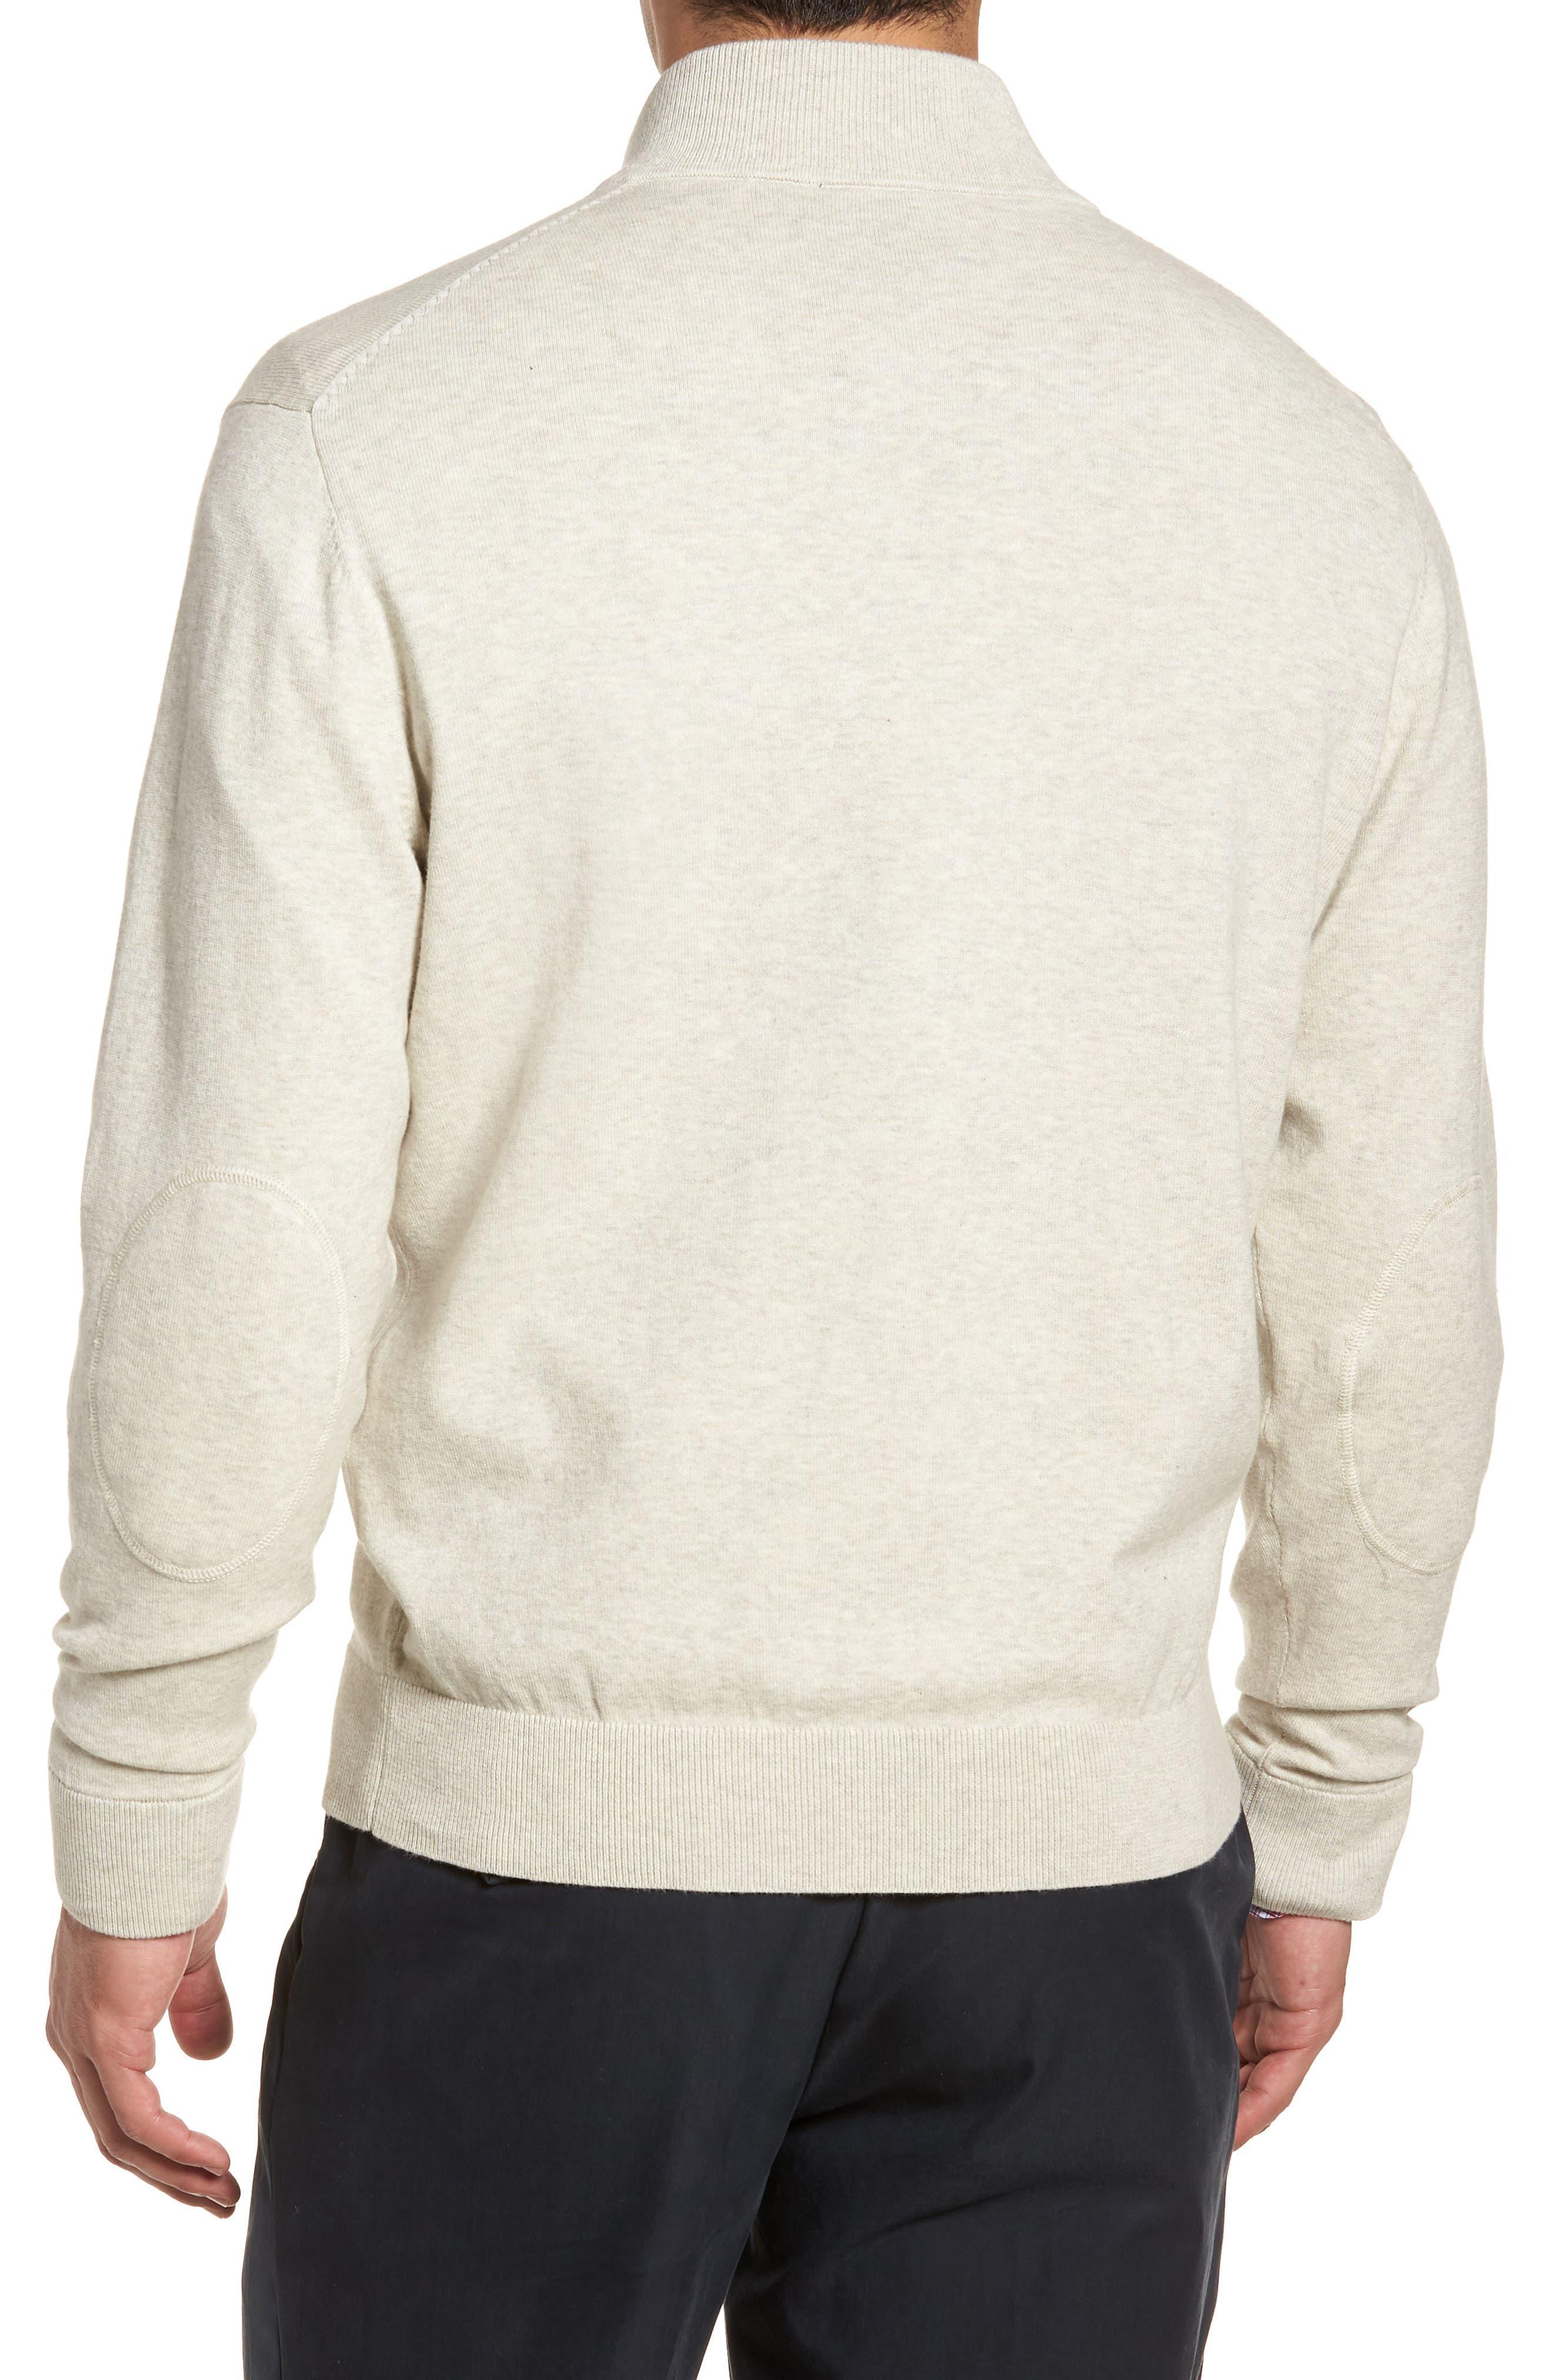 CUTTER & BUCK,                             Lakemont Classic Fit Quarter Zip Sweater,                             Alternate thumbnail 2, color,                             OATMEAL HEATHER